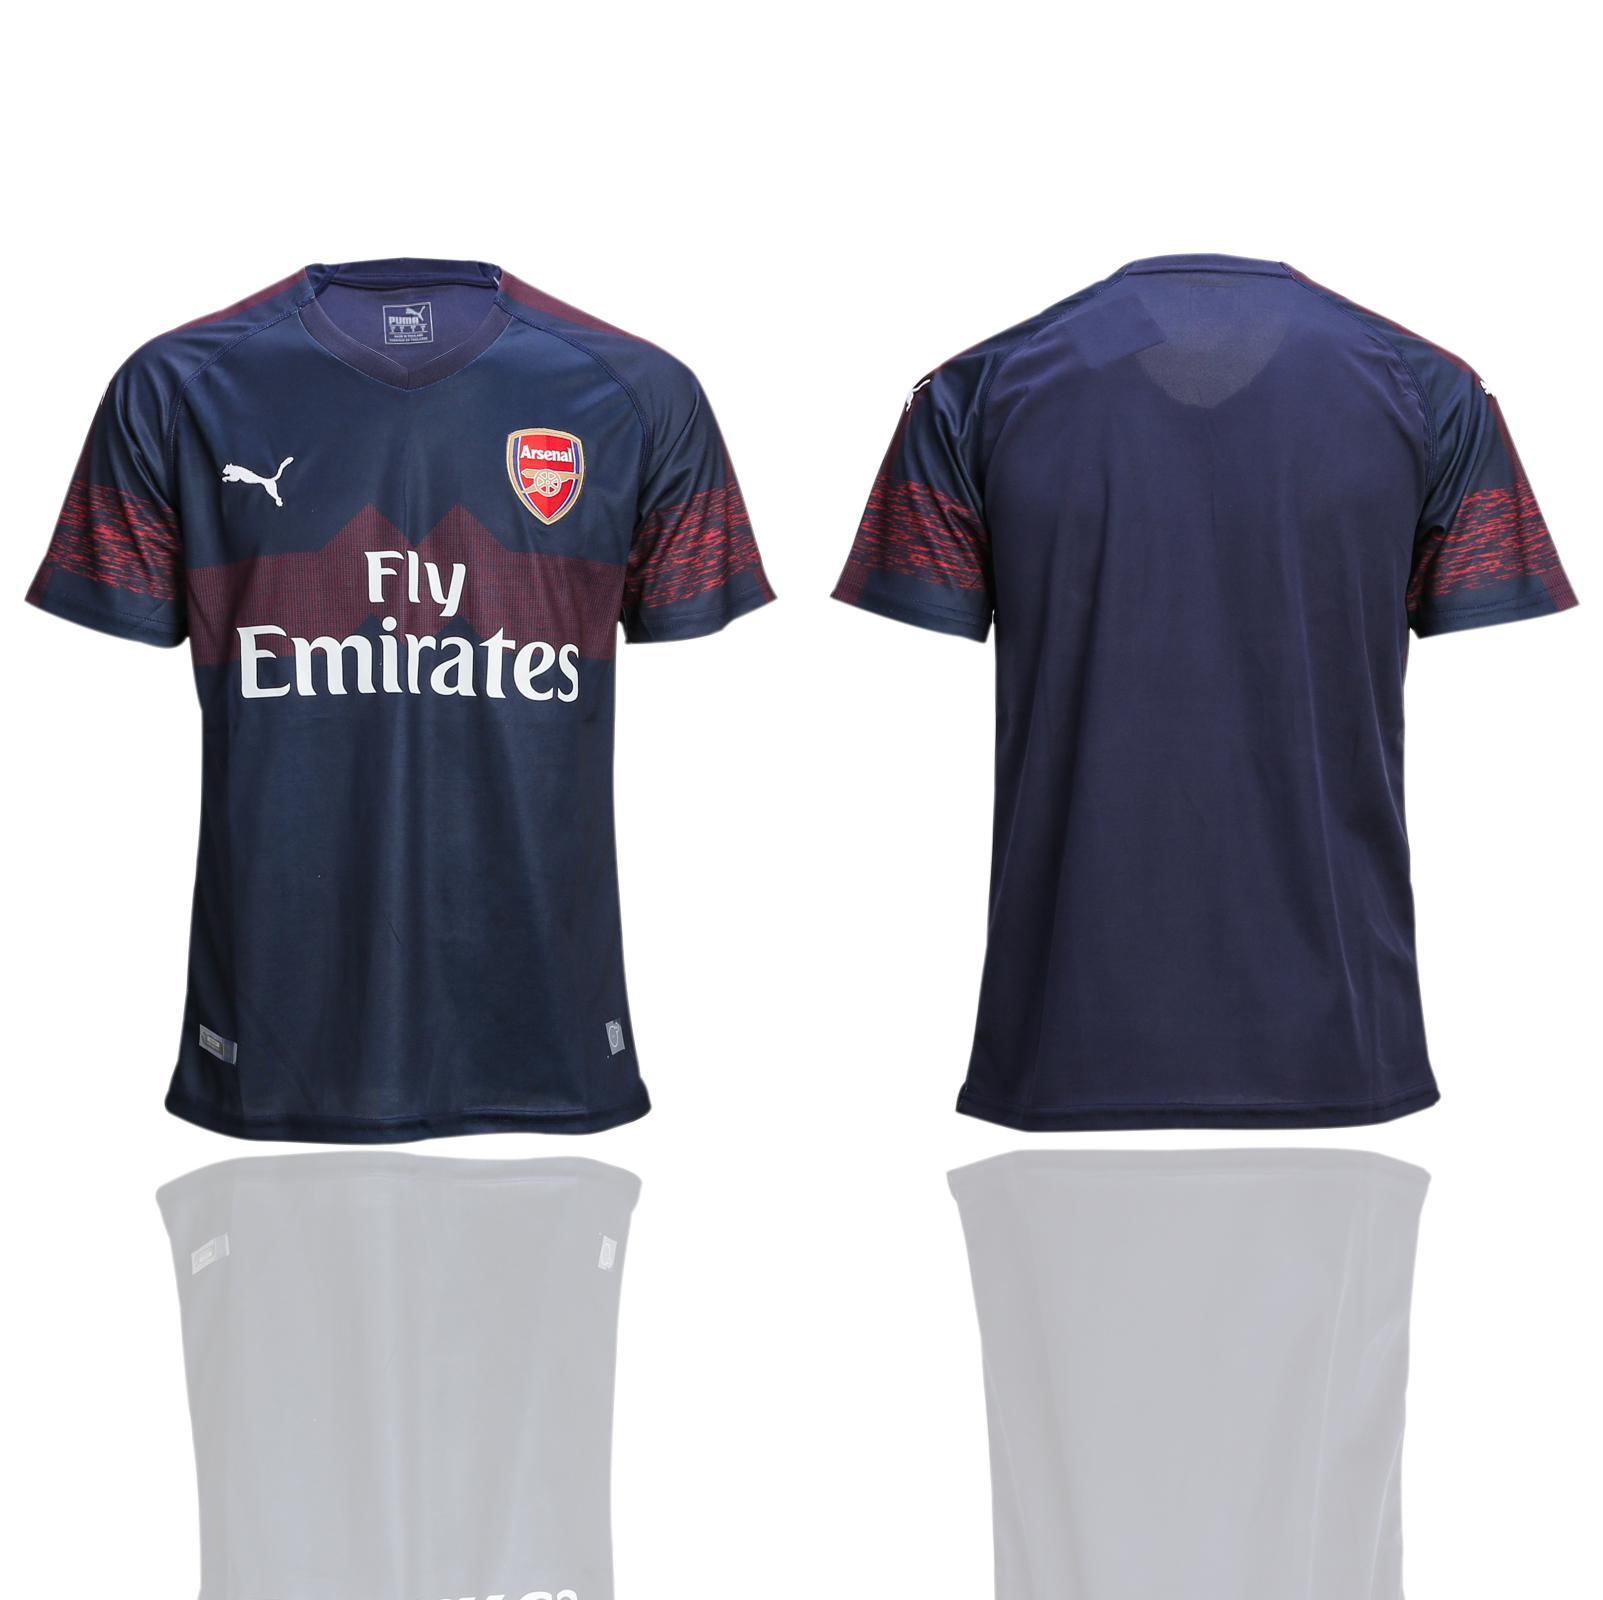 80000f140a6 2018-19 Arsenal Away Thailand Soccer Jersey